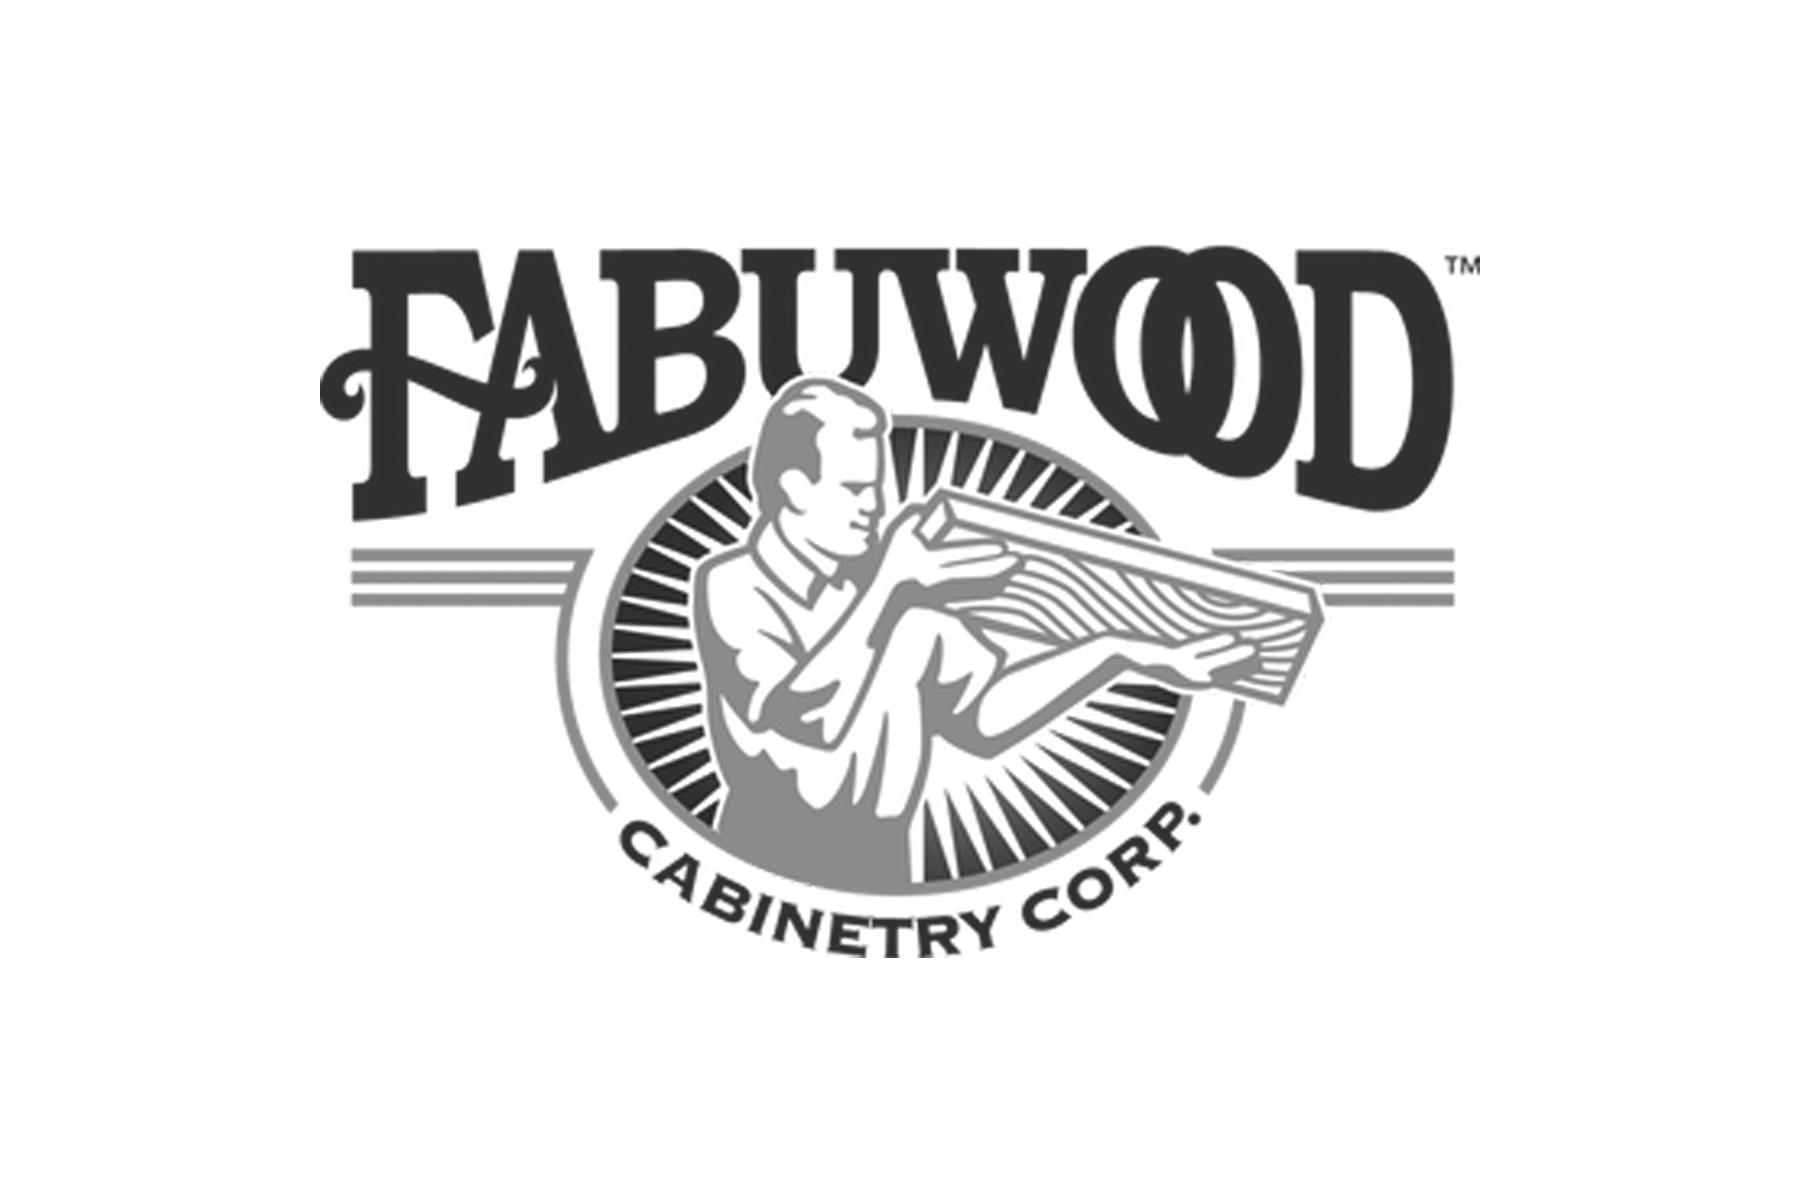 Fabuwood GS.jpg